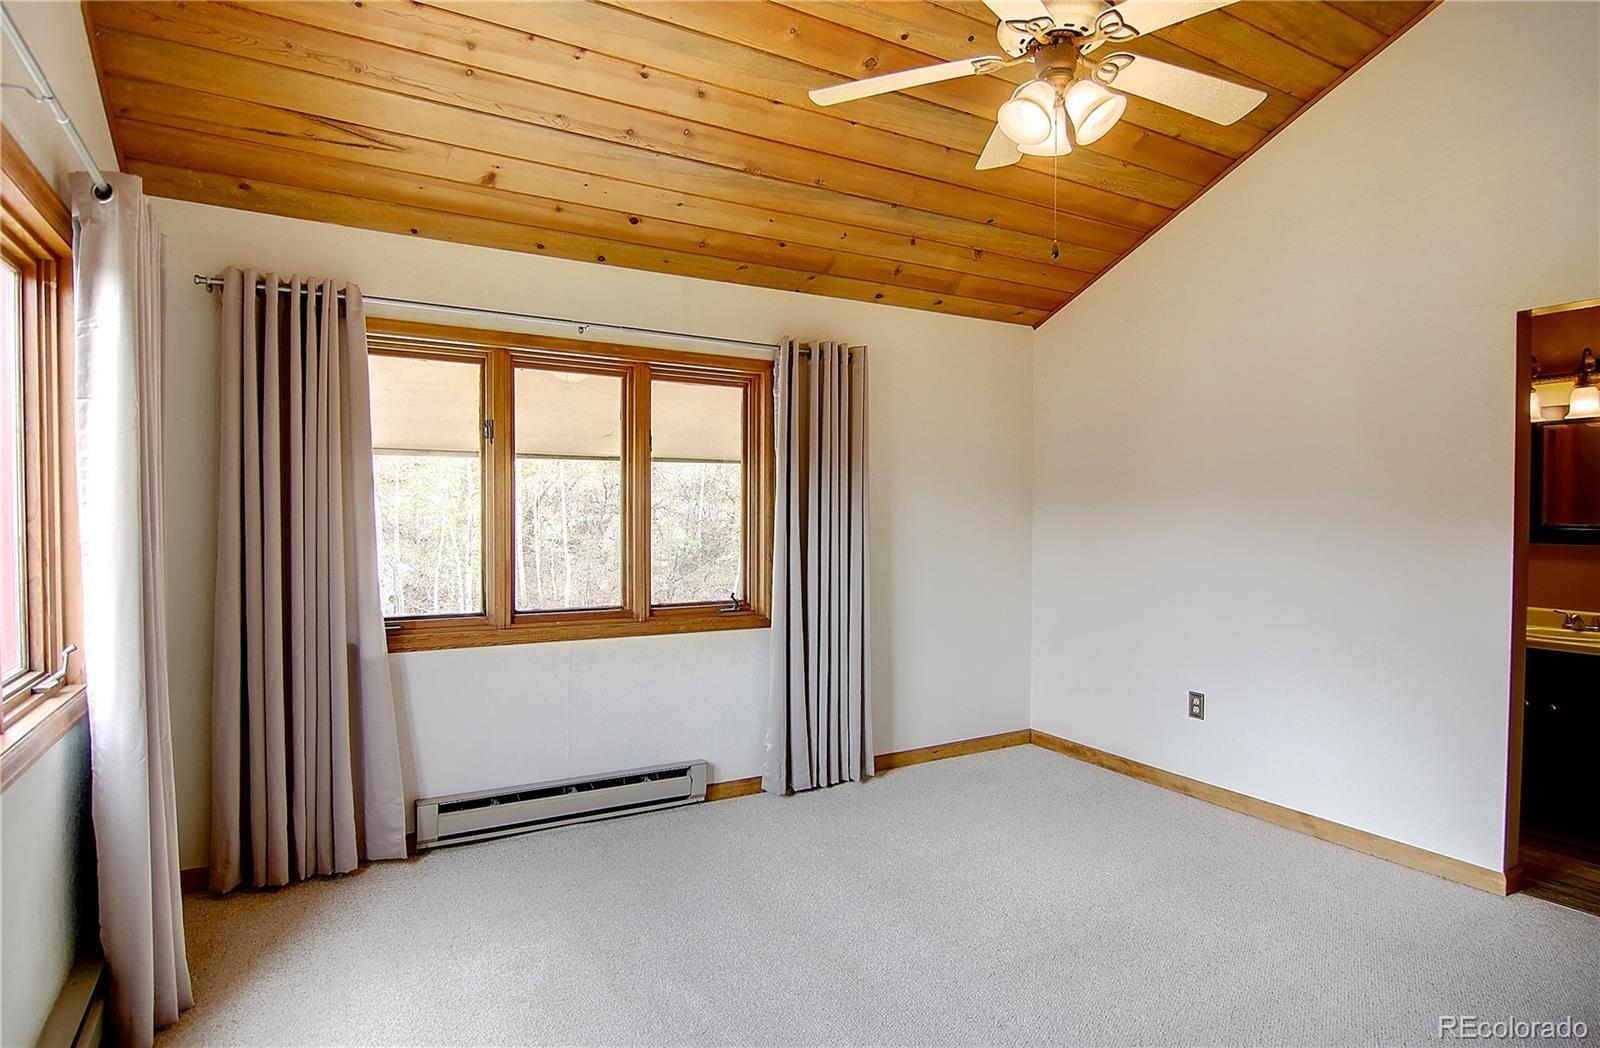 MLS# 2309963 - 18 - 1145 Overlook Drive #C1, Steamboat Springs, CO 80487